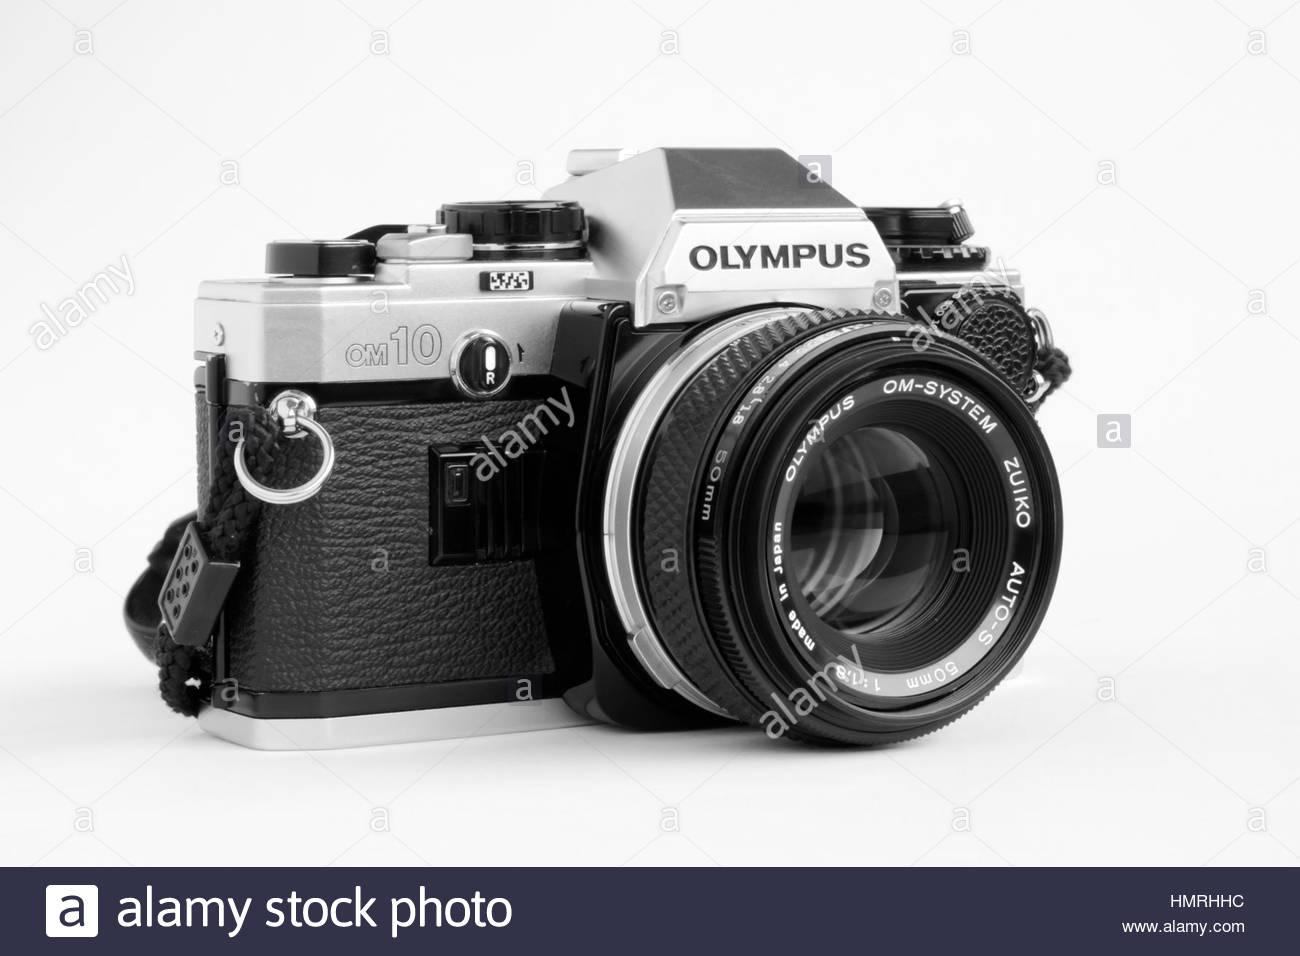 Olympus OM10 35mm Film Camera, Black and White Stock Photo